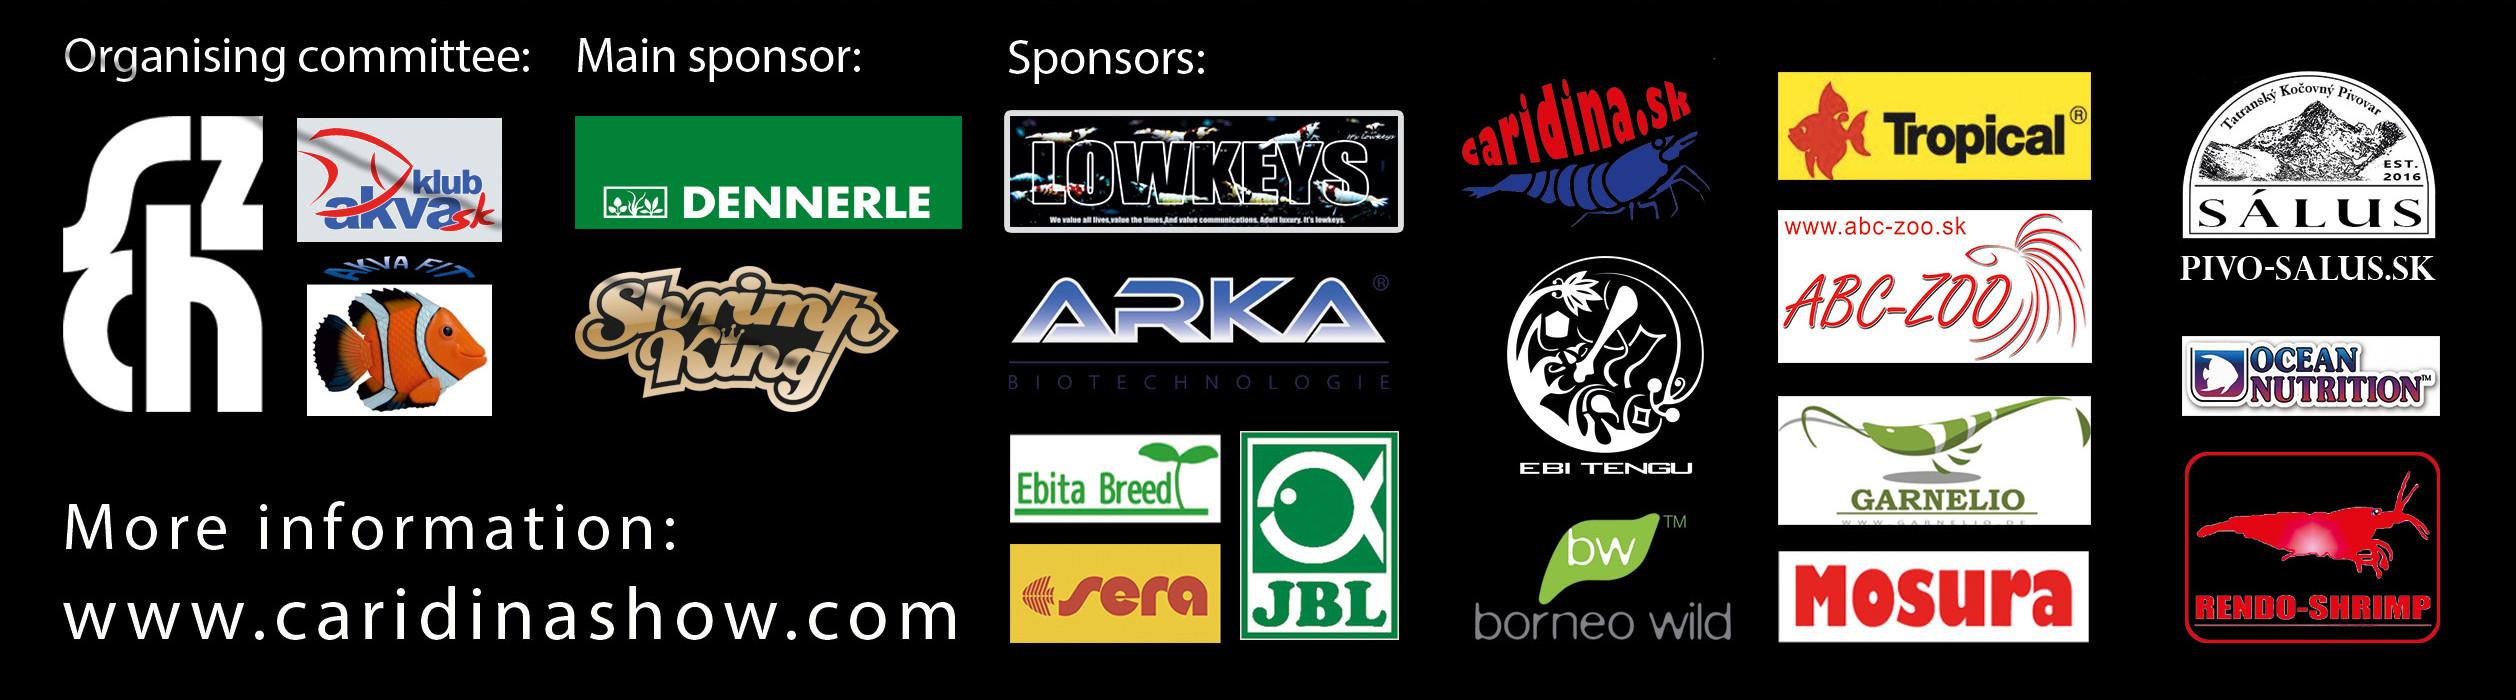 Slovak Caridina Show 2016-sponzors